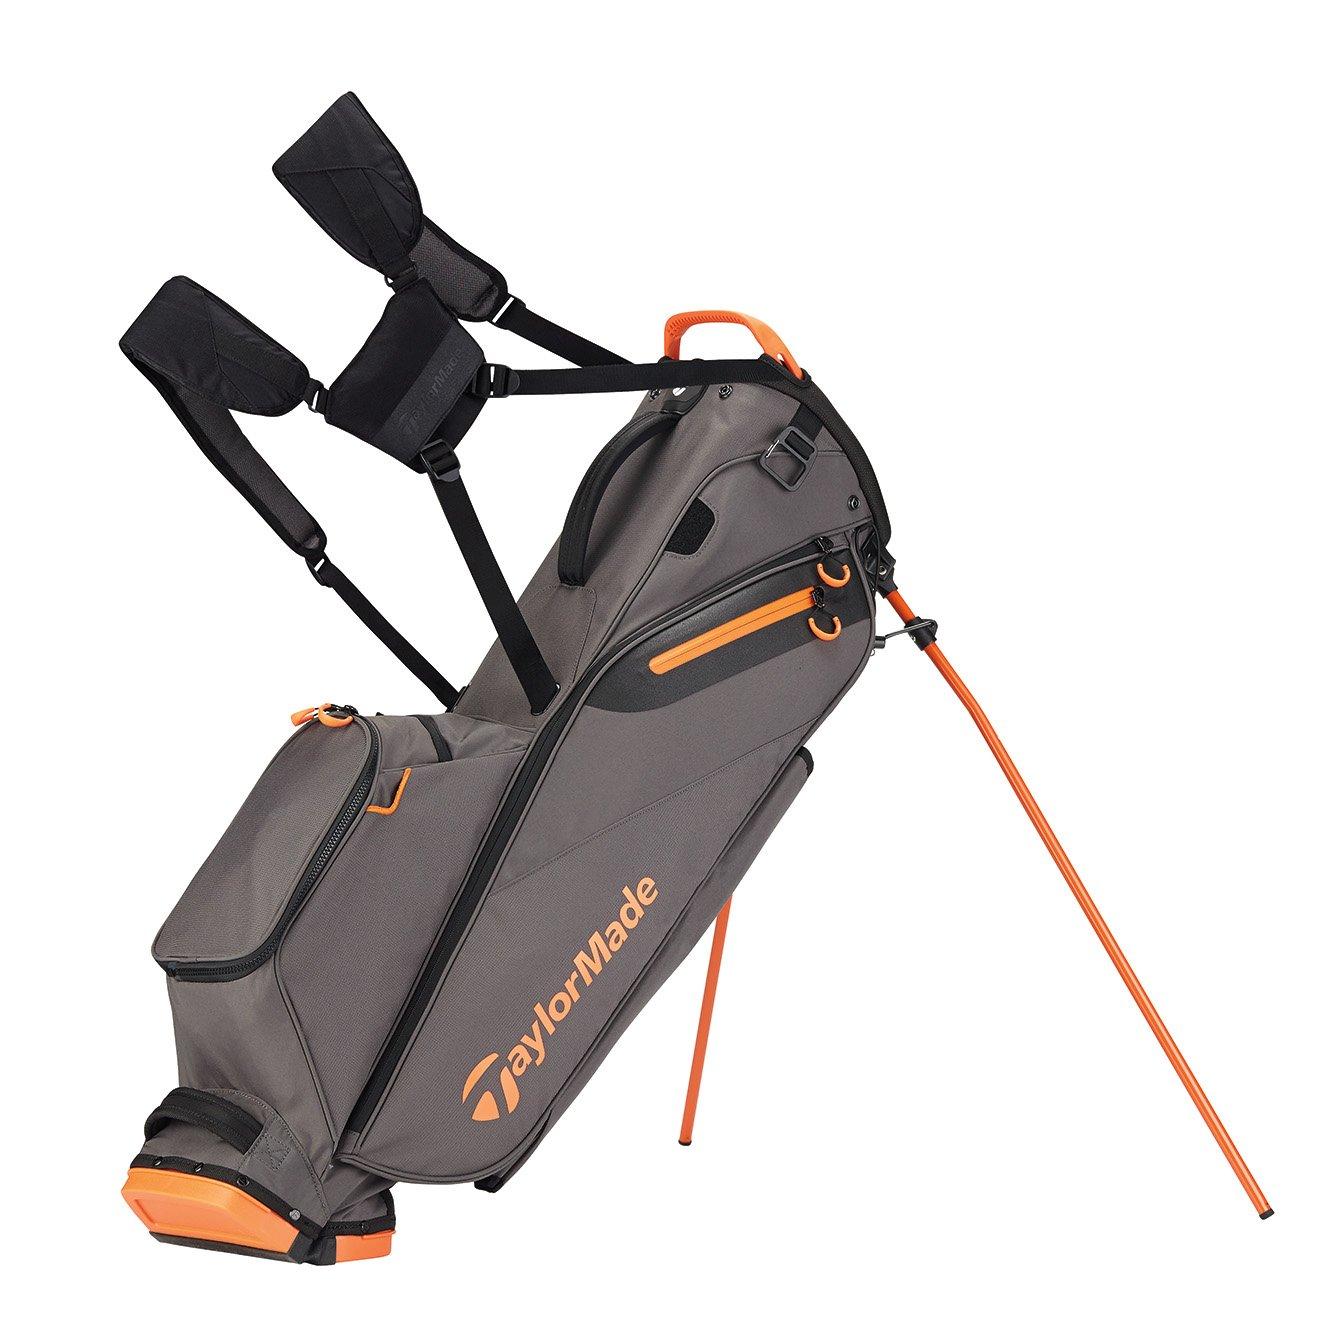 TaylorMade Golf Flextech Lite Stand Bag Gray/Orange (Grey/Orange)